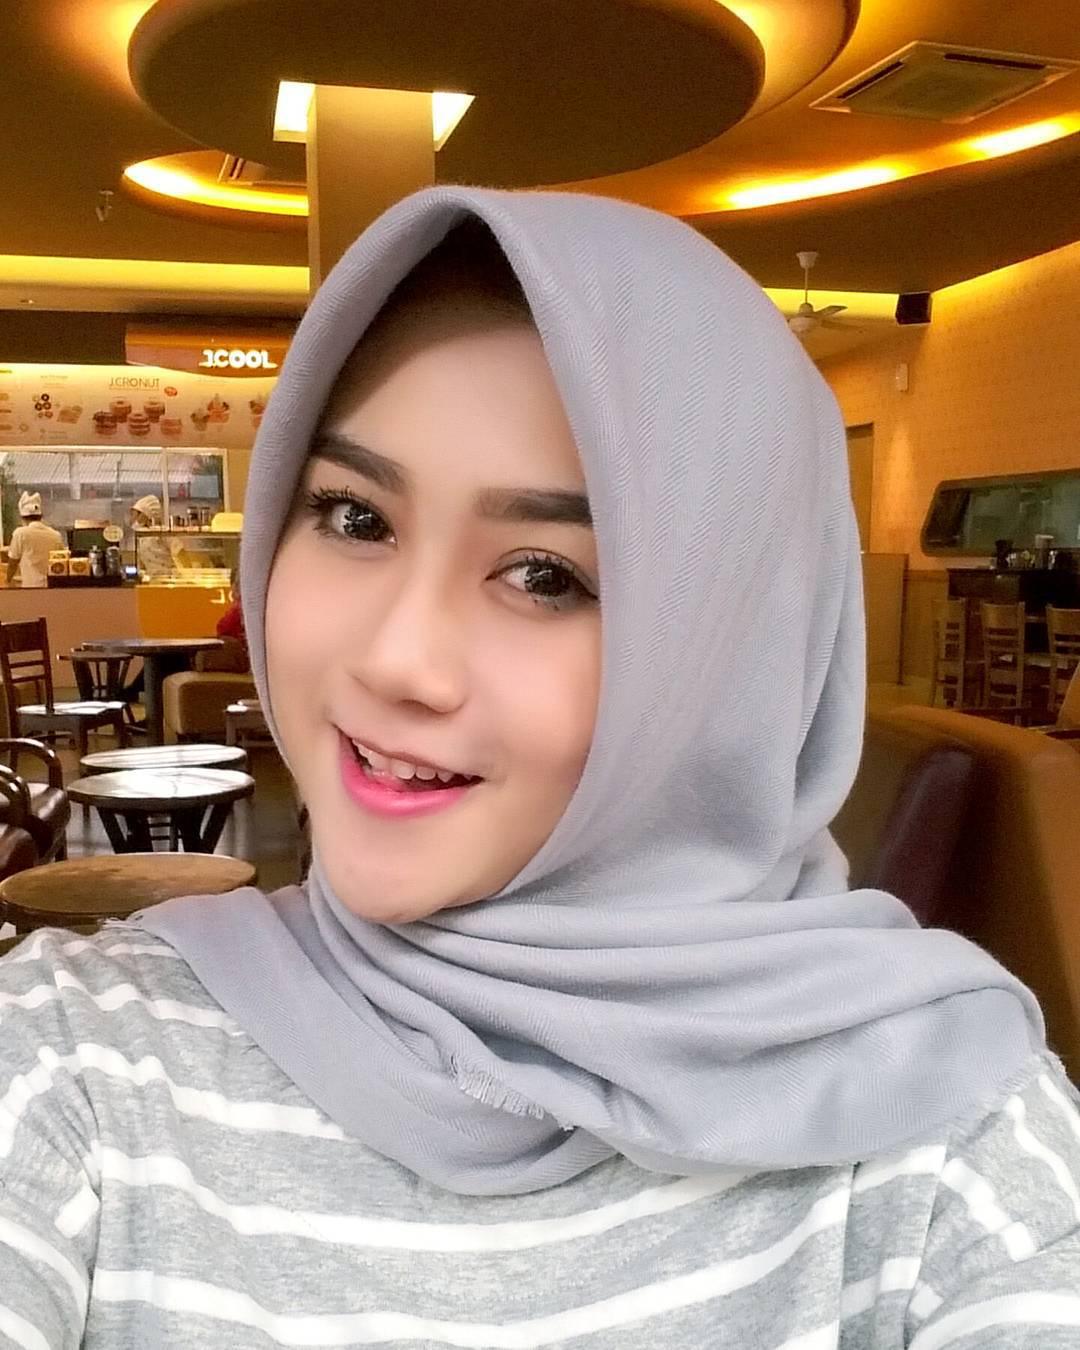 Seribu Hijabers: My Face